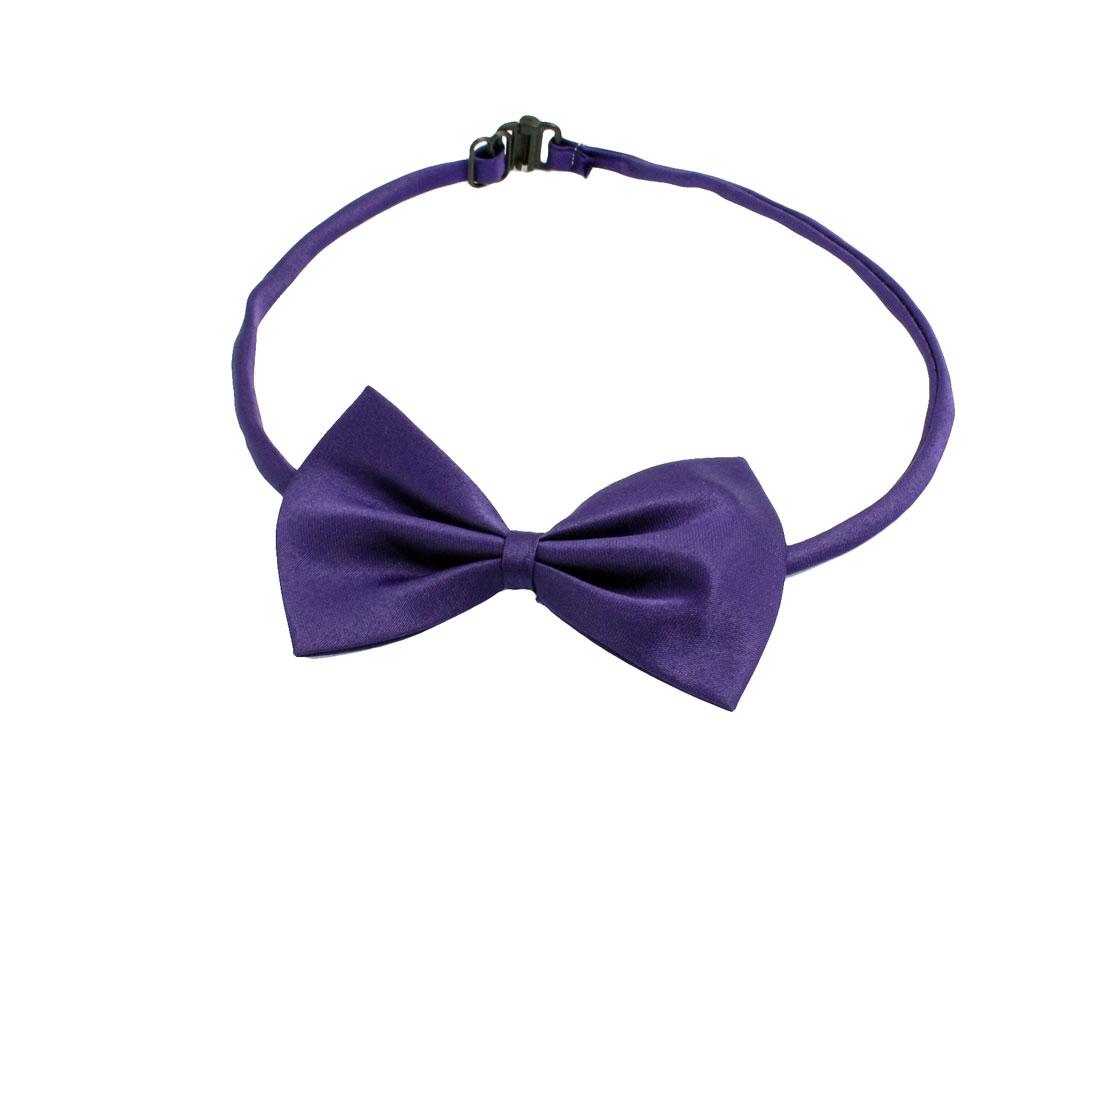 2 Pcs Adjustable Dog Doggie Puppy Collar Bowtie Bow Ties Purple